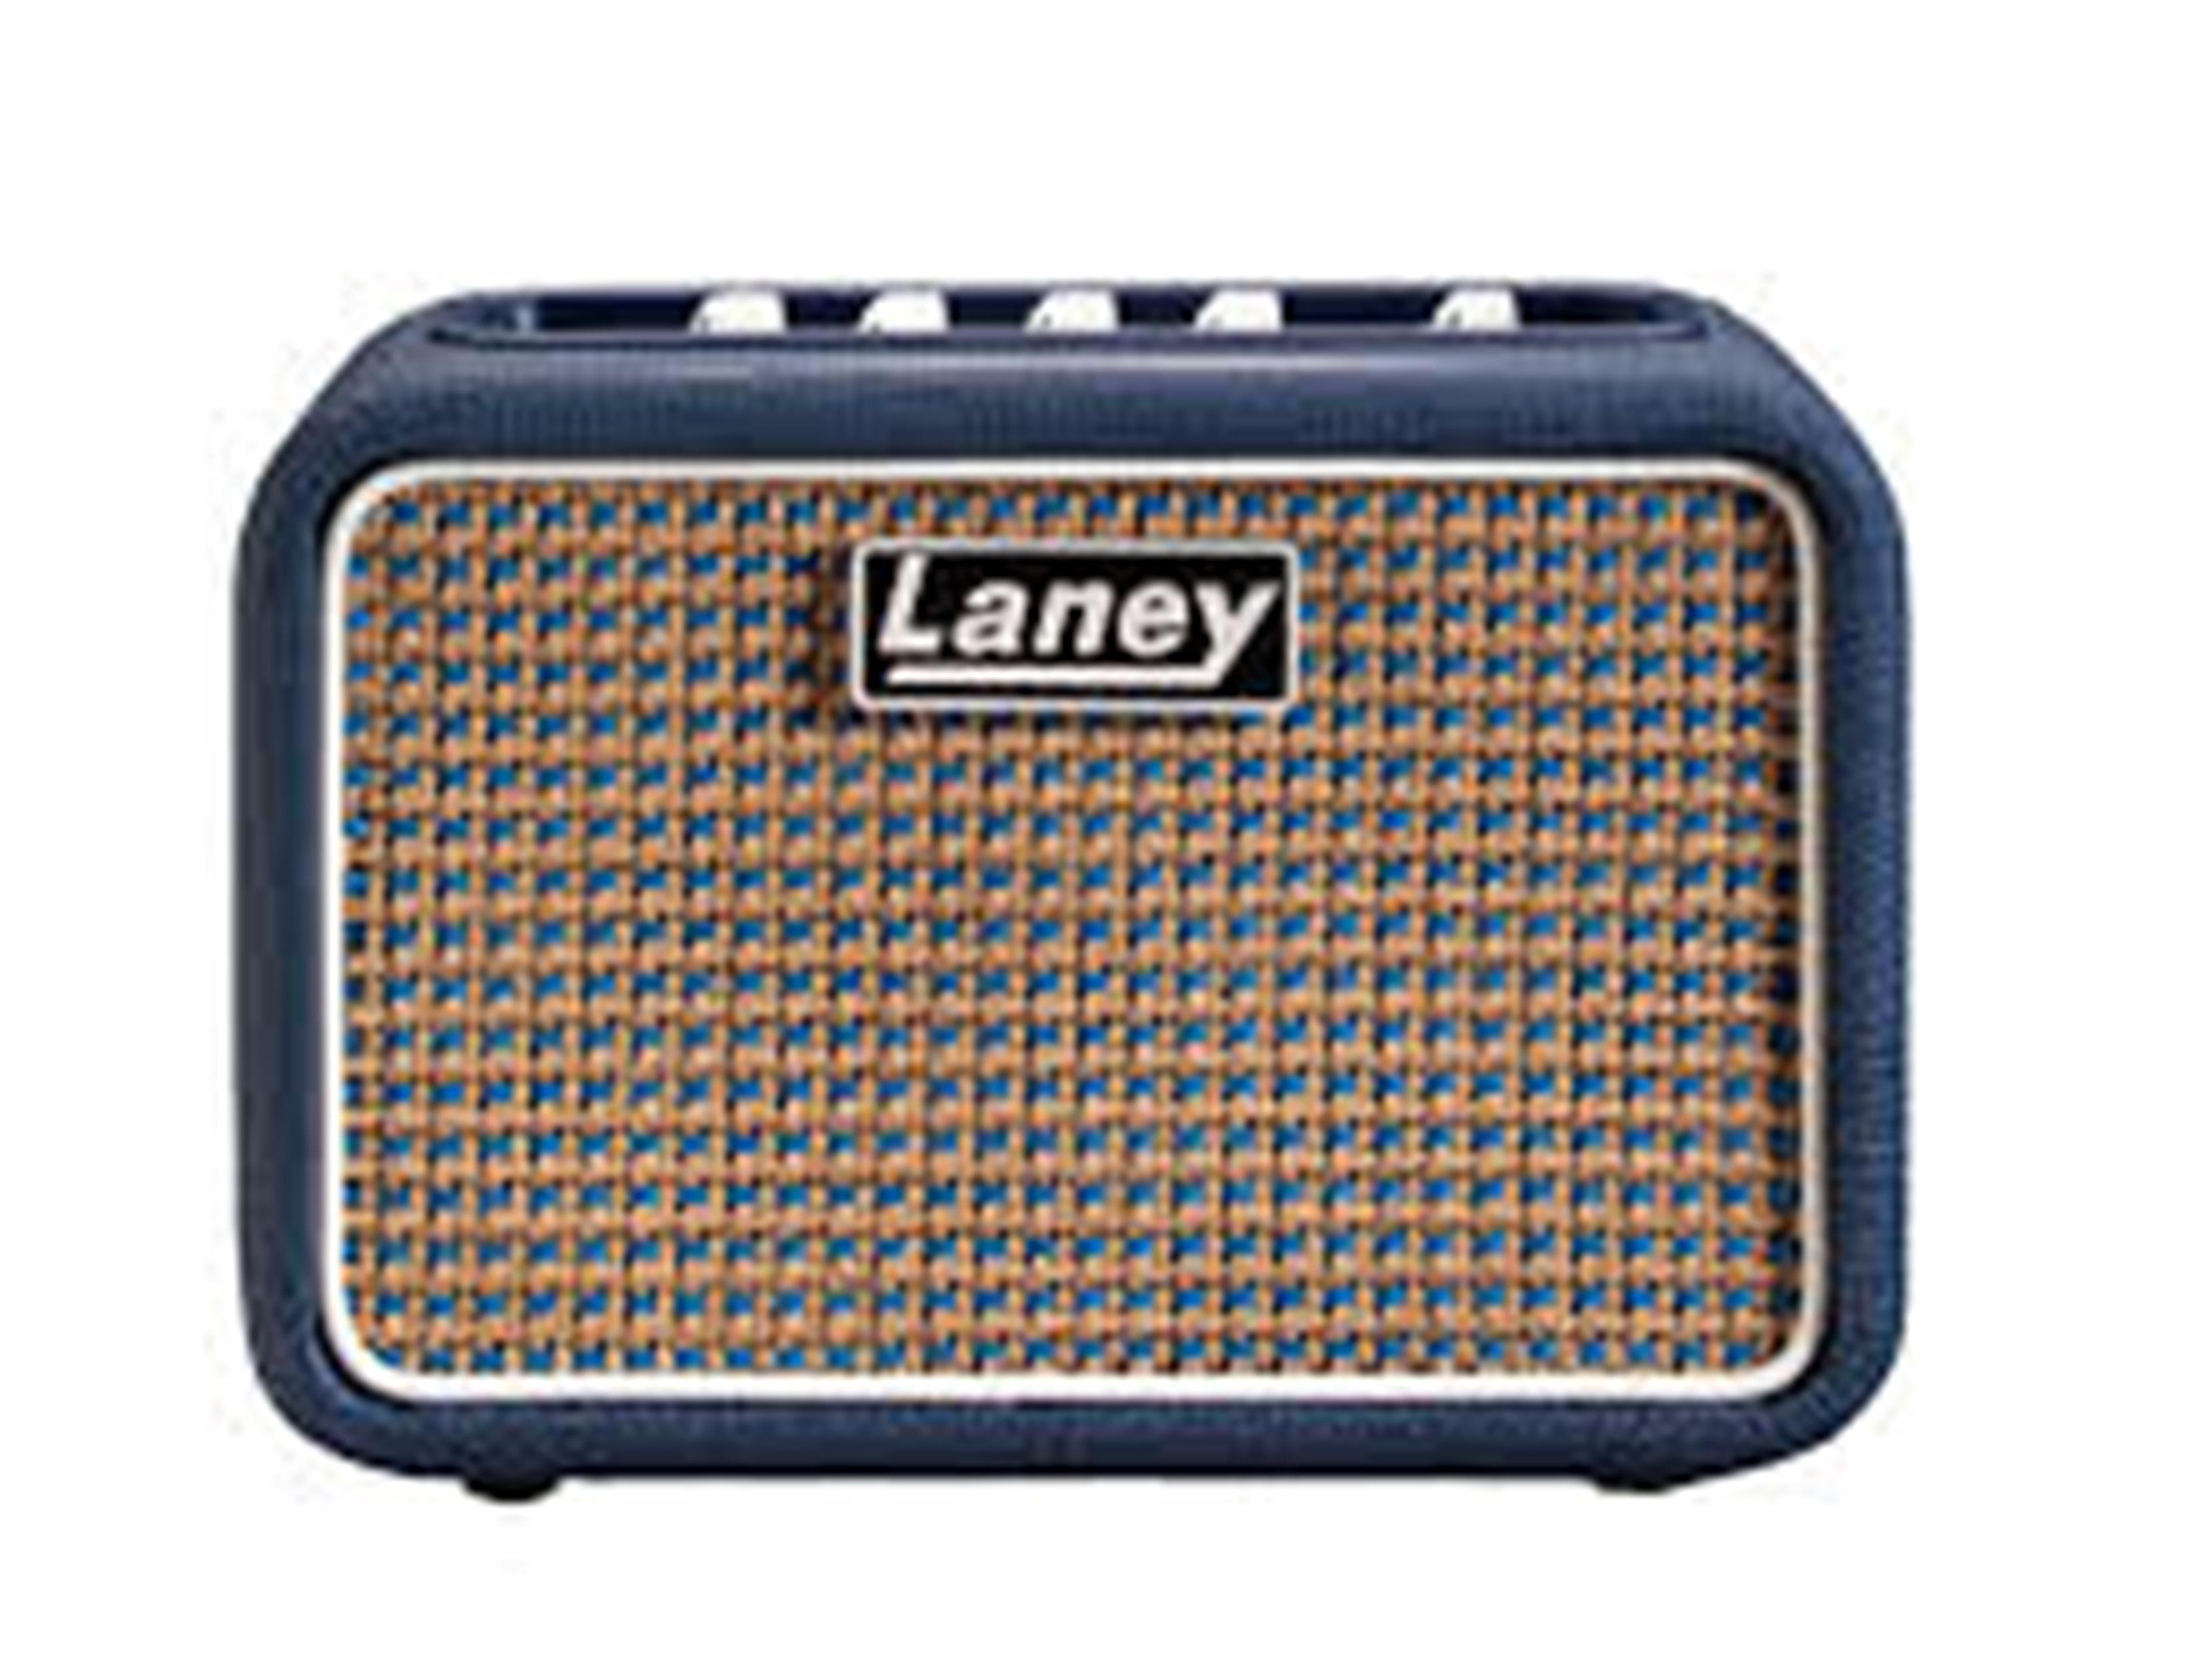 LANEY-MINI-ST-LION-mini-combo-smart-LIONHEART-Stereo-delay-A-BATTERIE-sku-20645